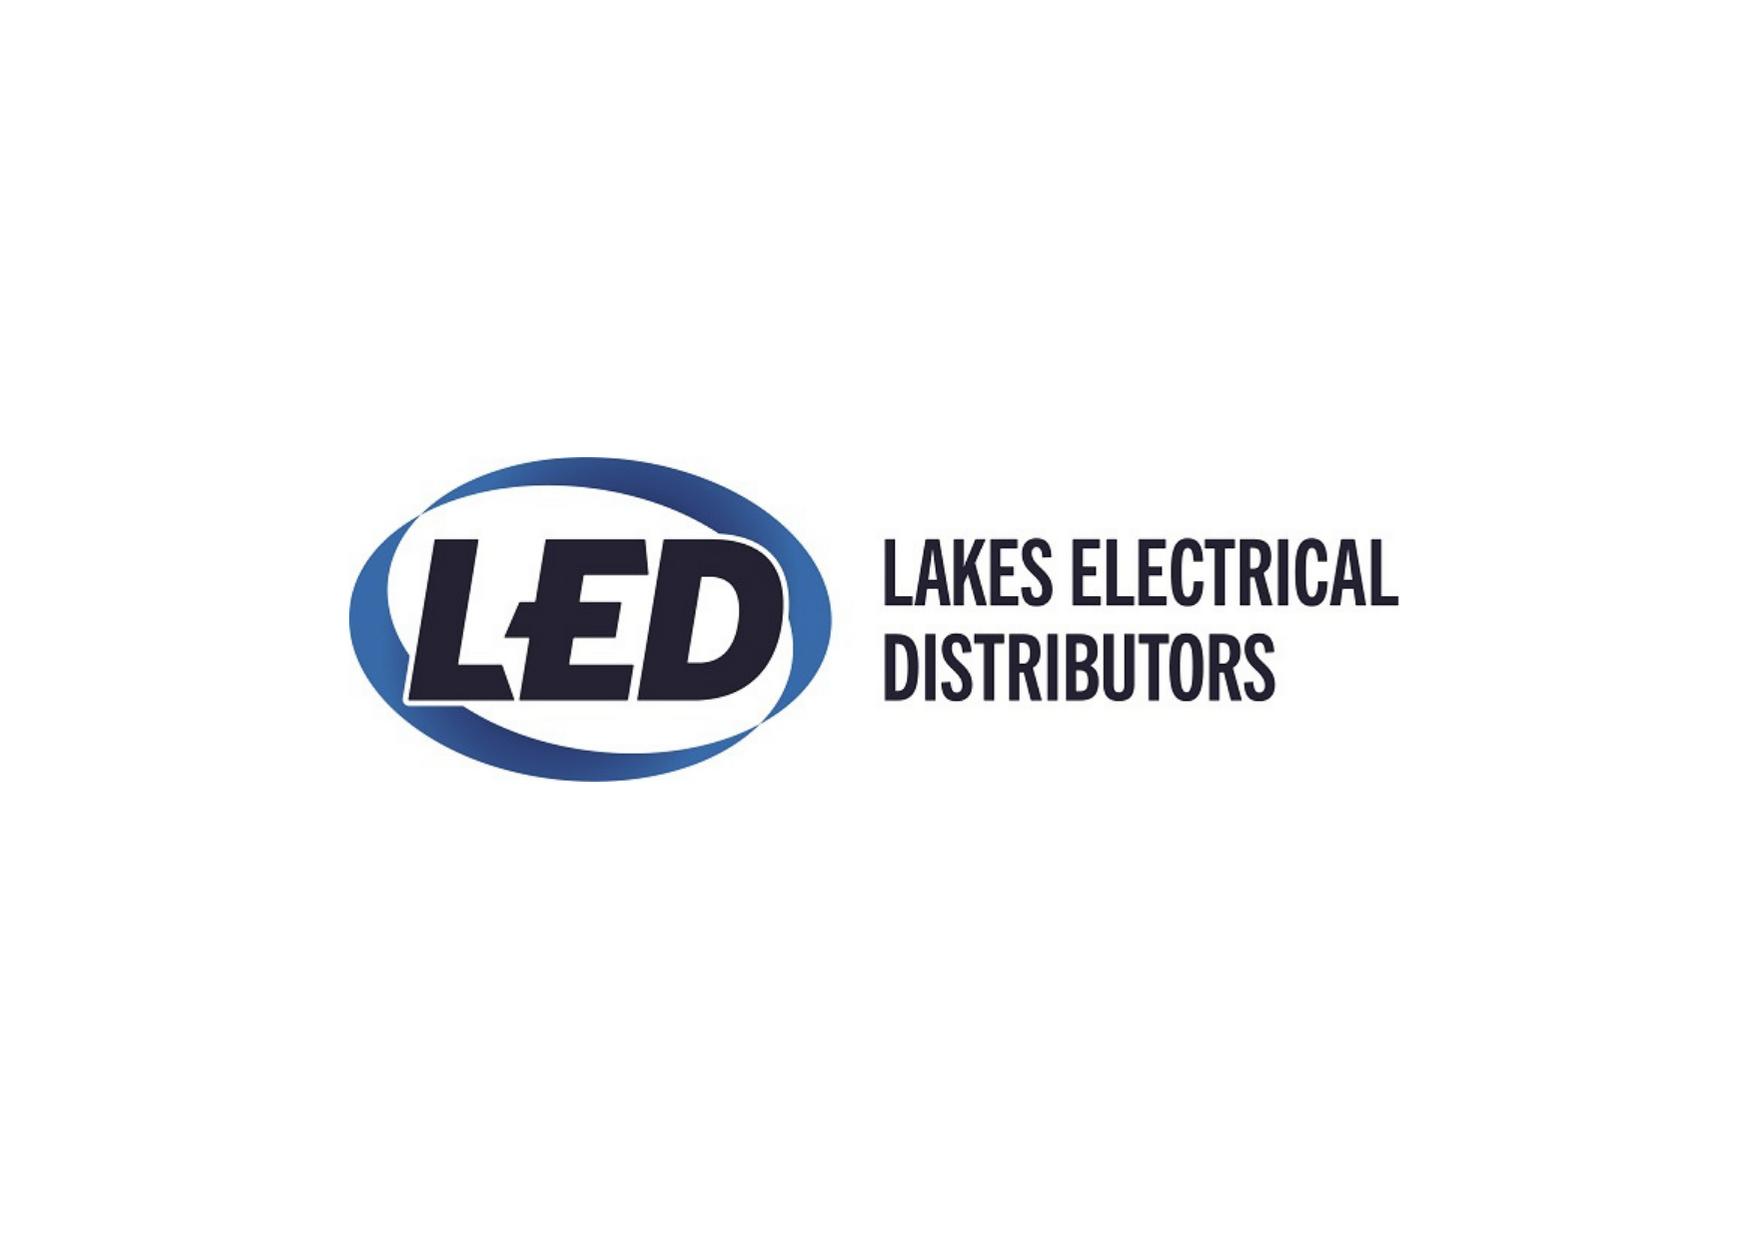 Lakes Electrical Distributors